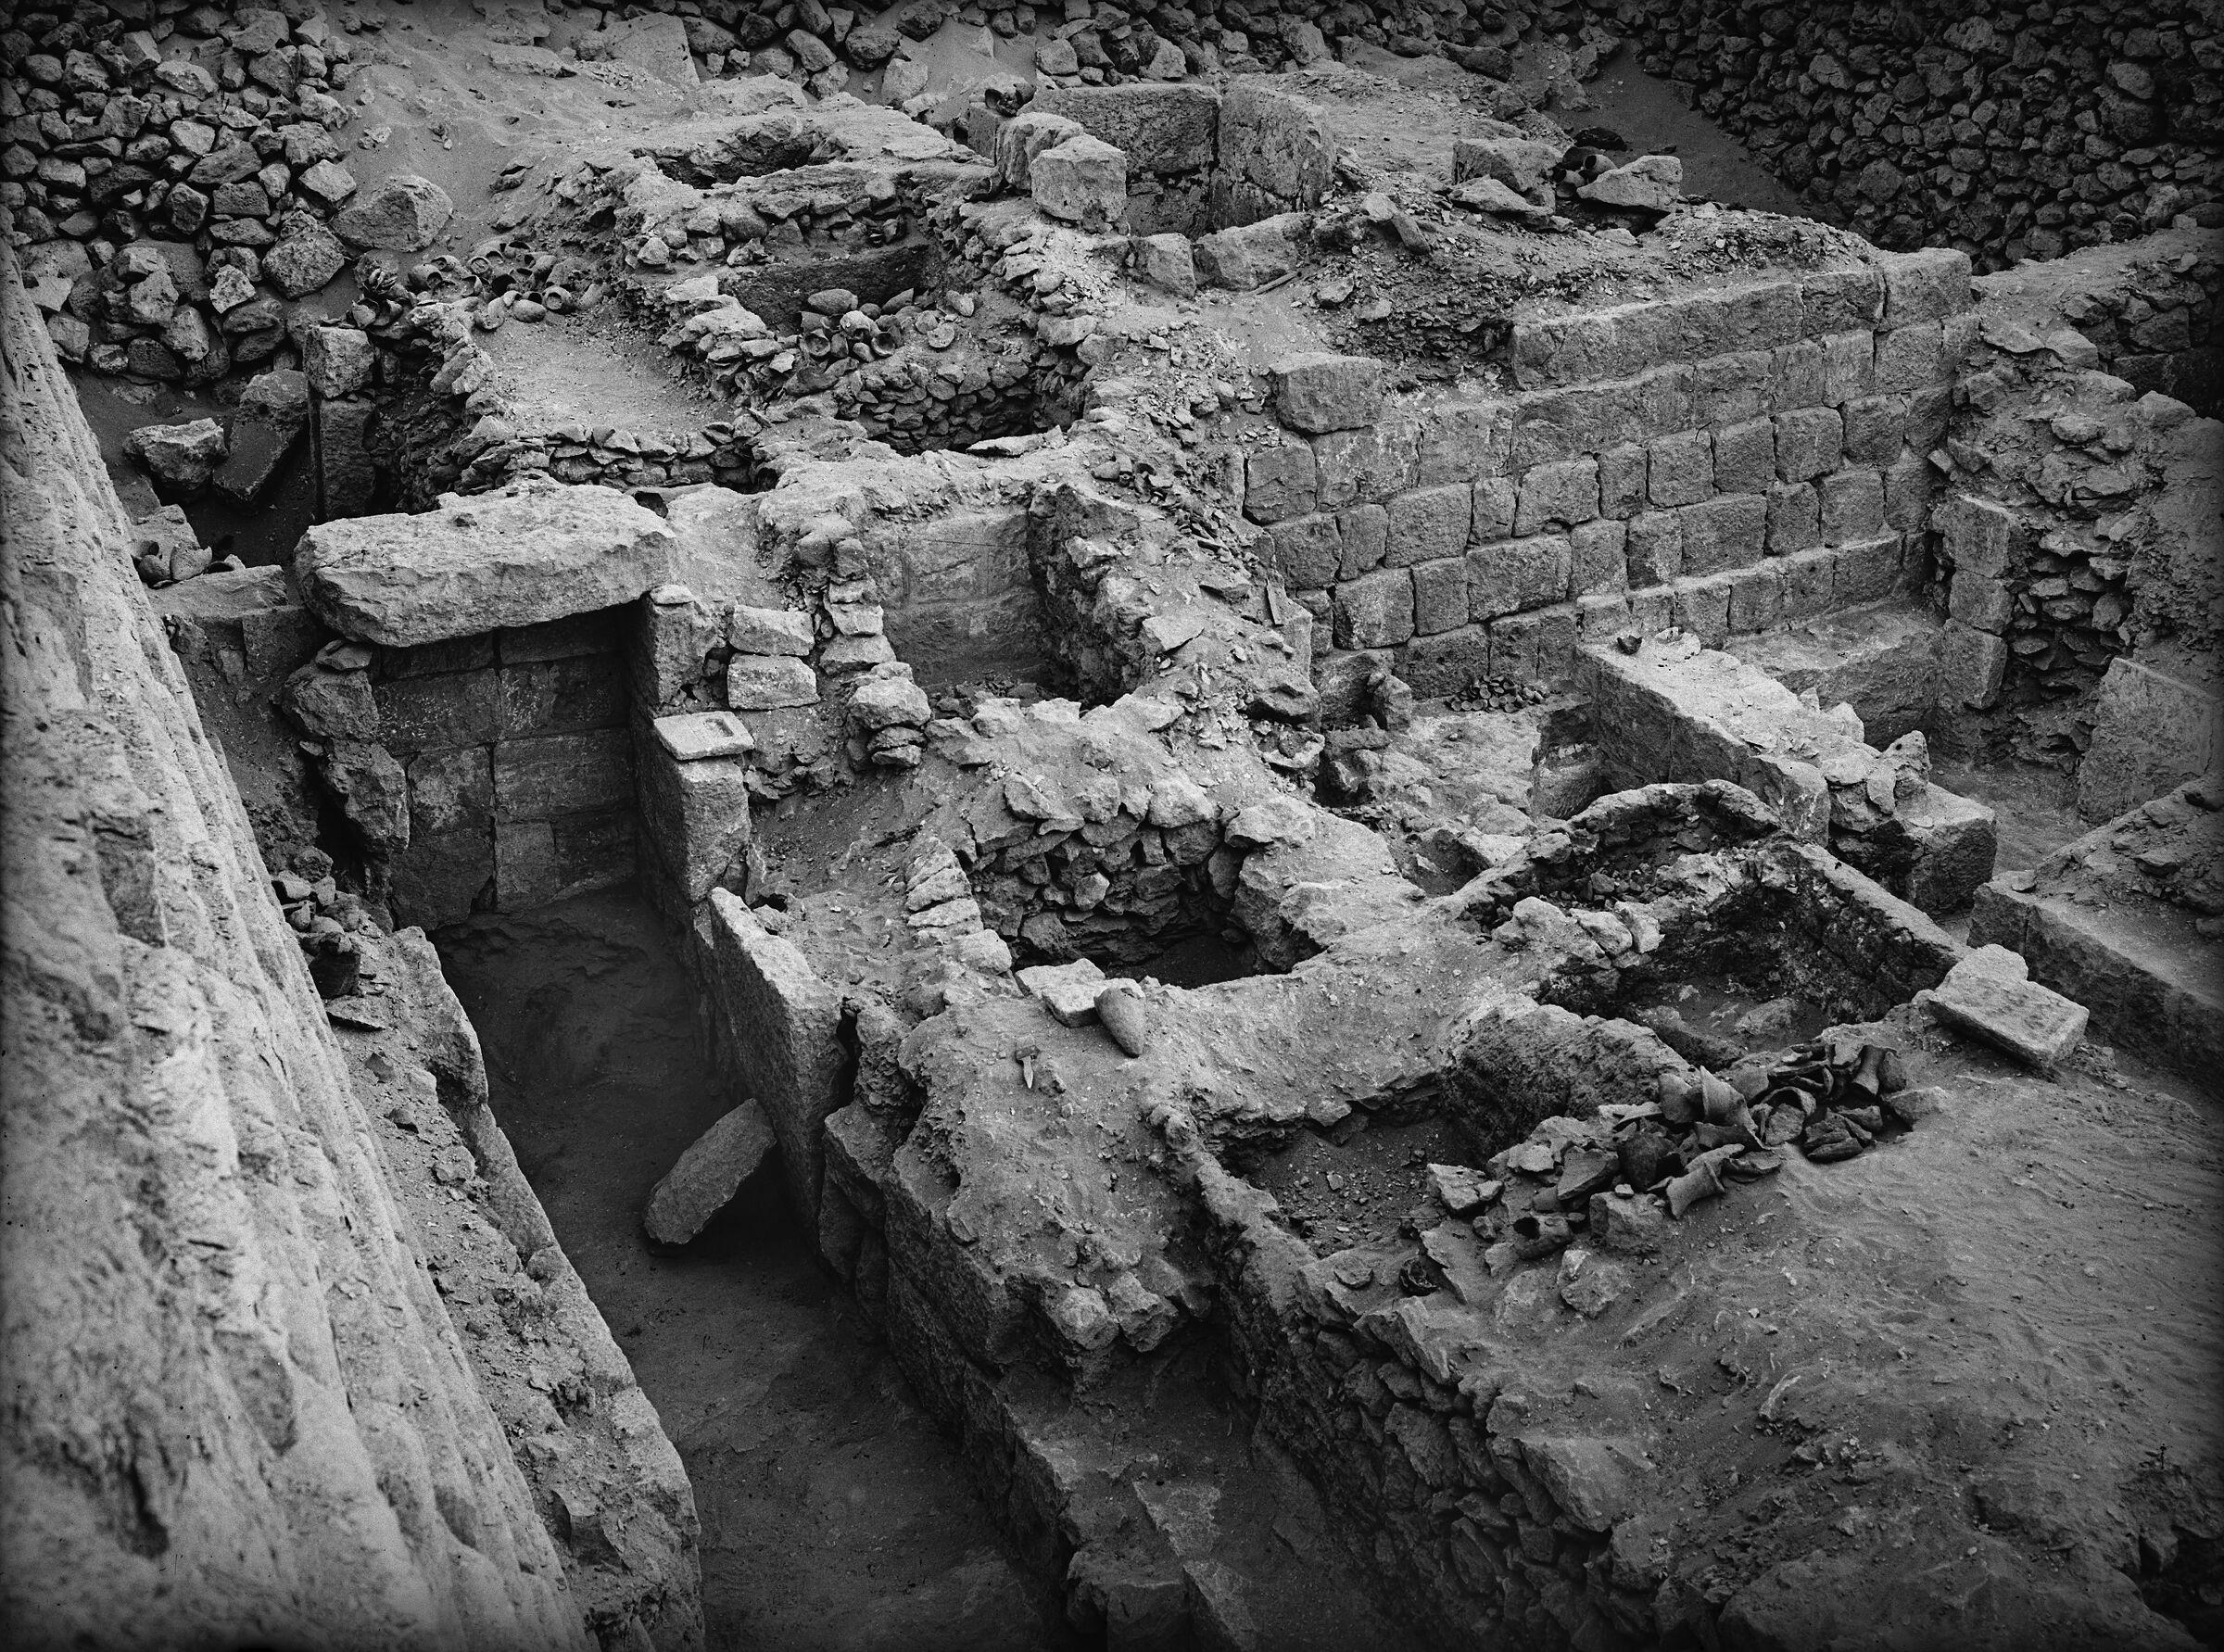 Western Cemetery: Site: Giza; View: G 1366, G 1365, G 1364, G 1363, G 1362, G 1361, G 1360